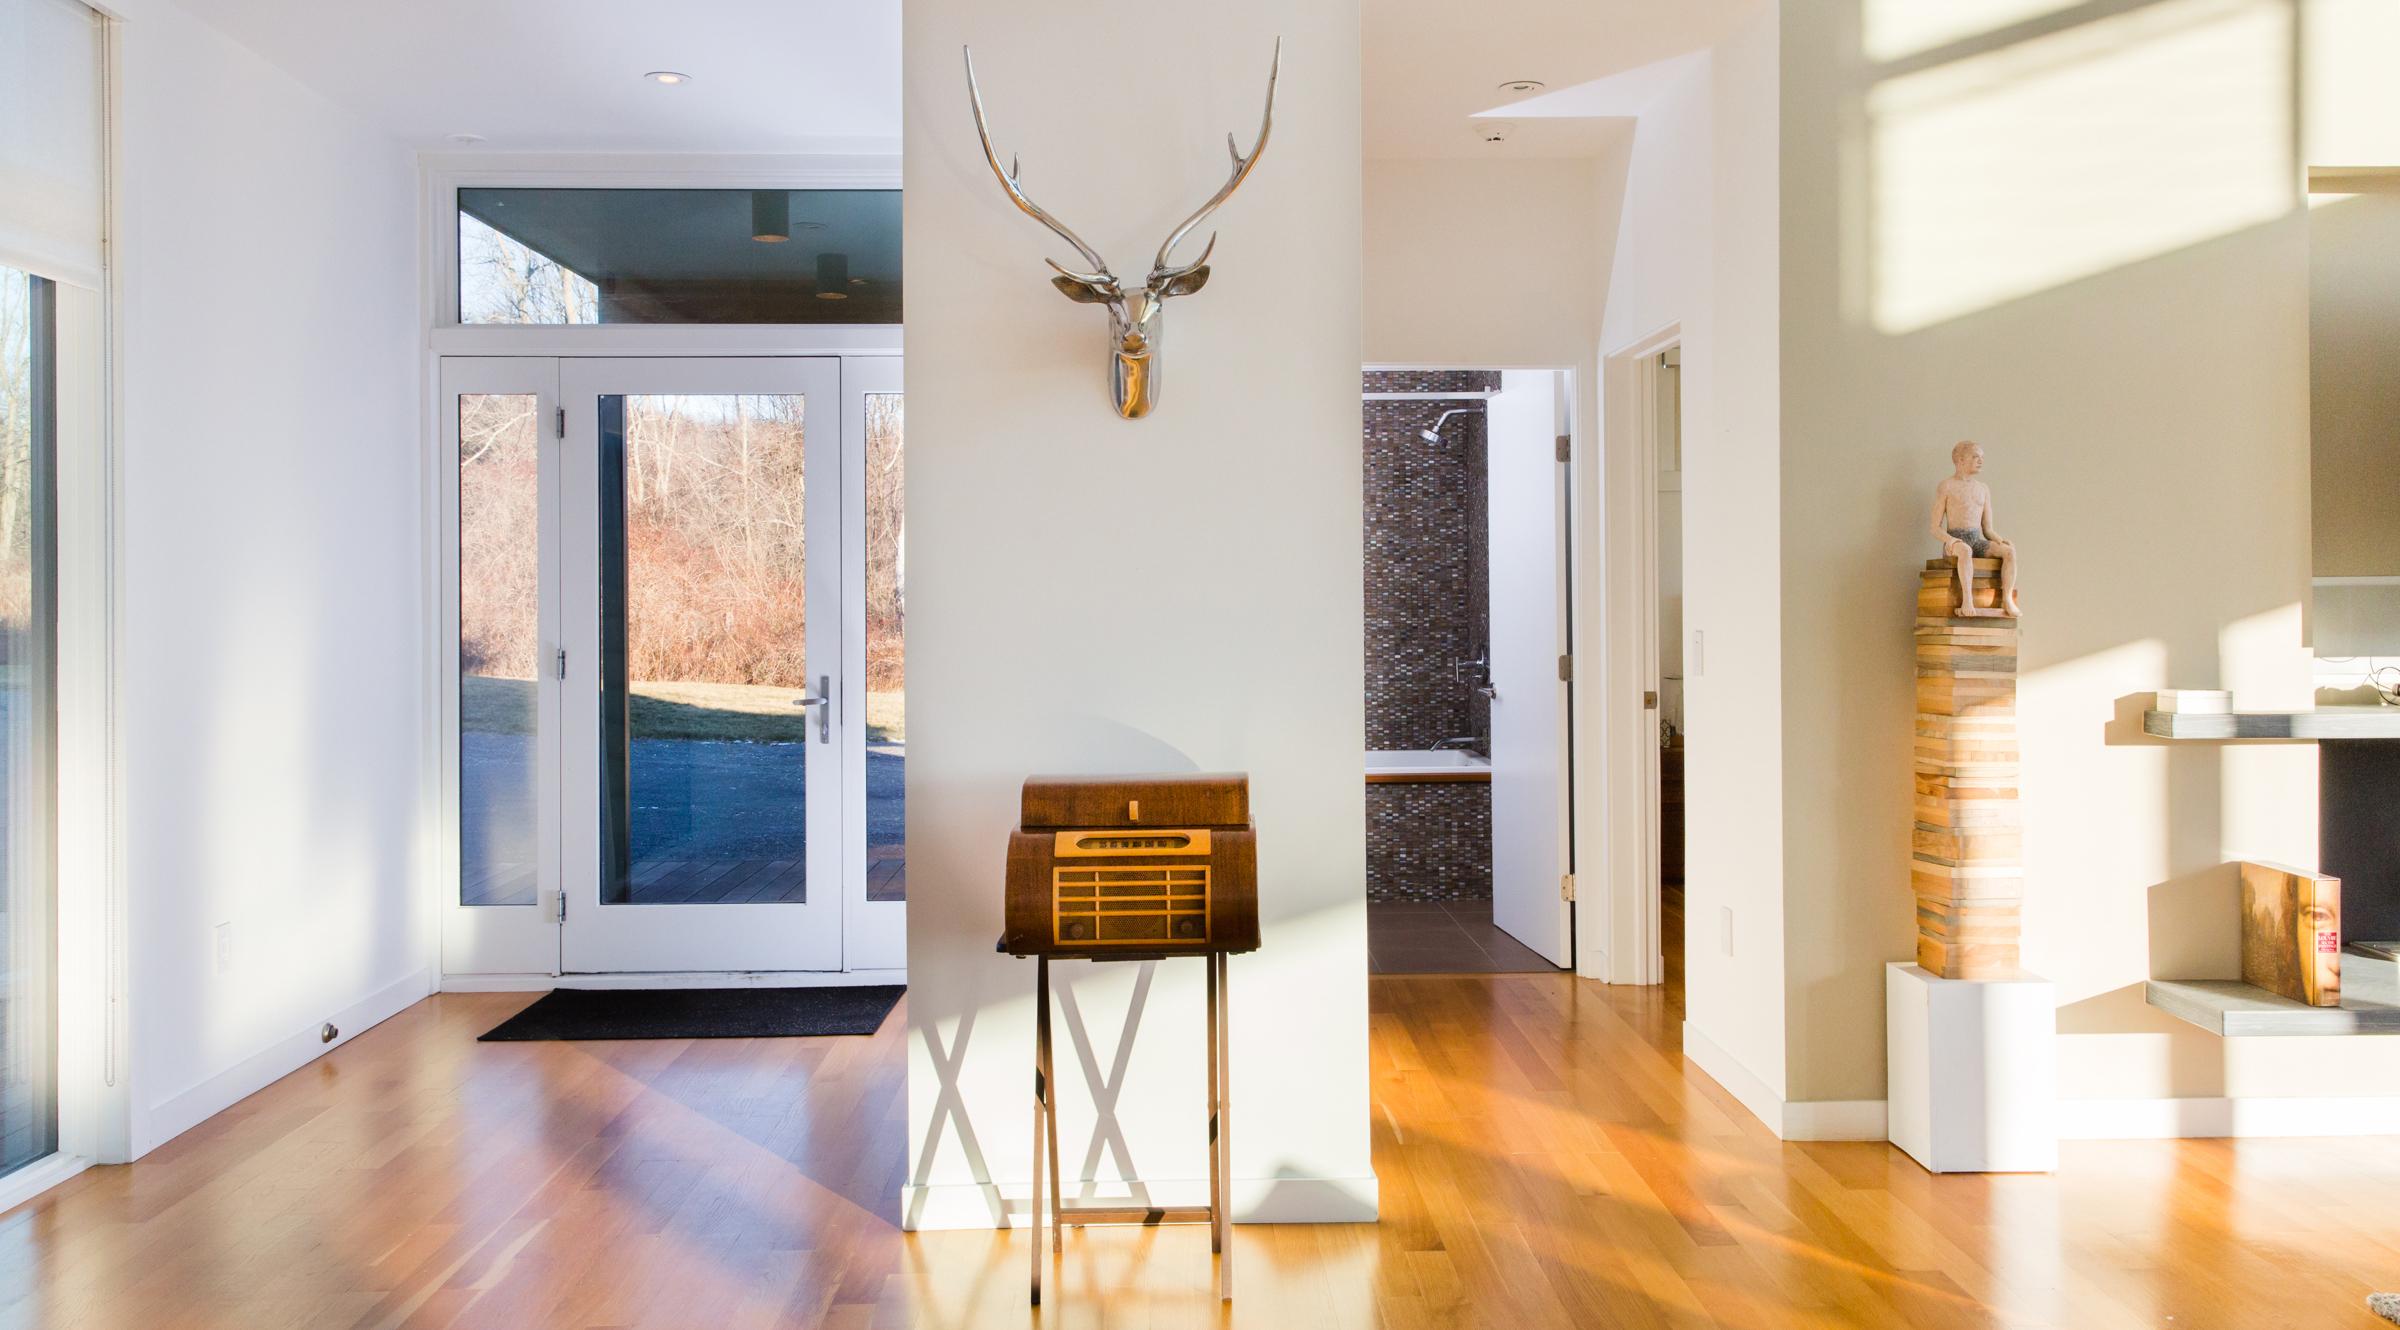 turkel_modern_design_prefab_home_writers_retreat_entryway.jpg